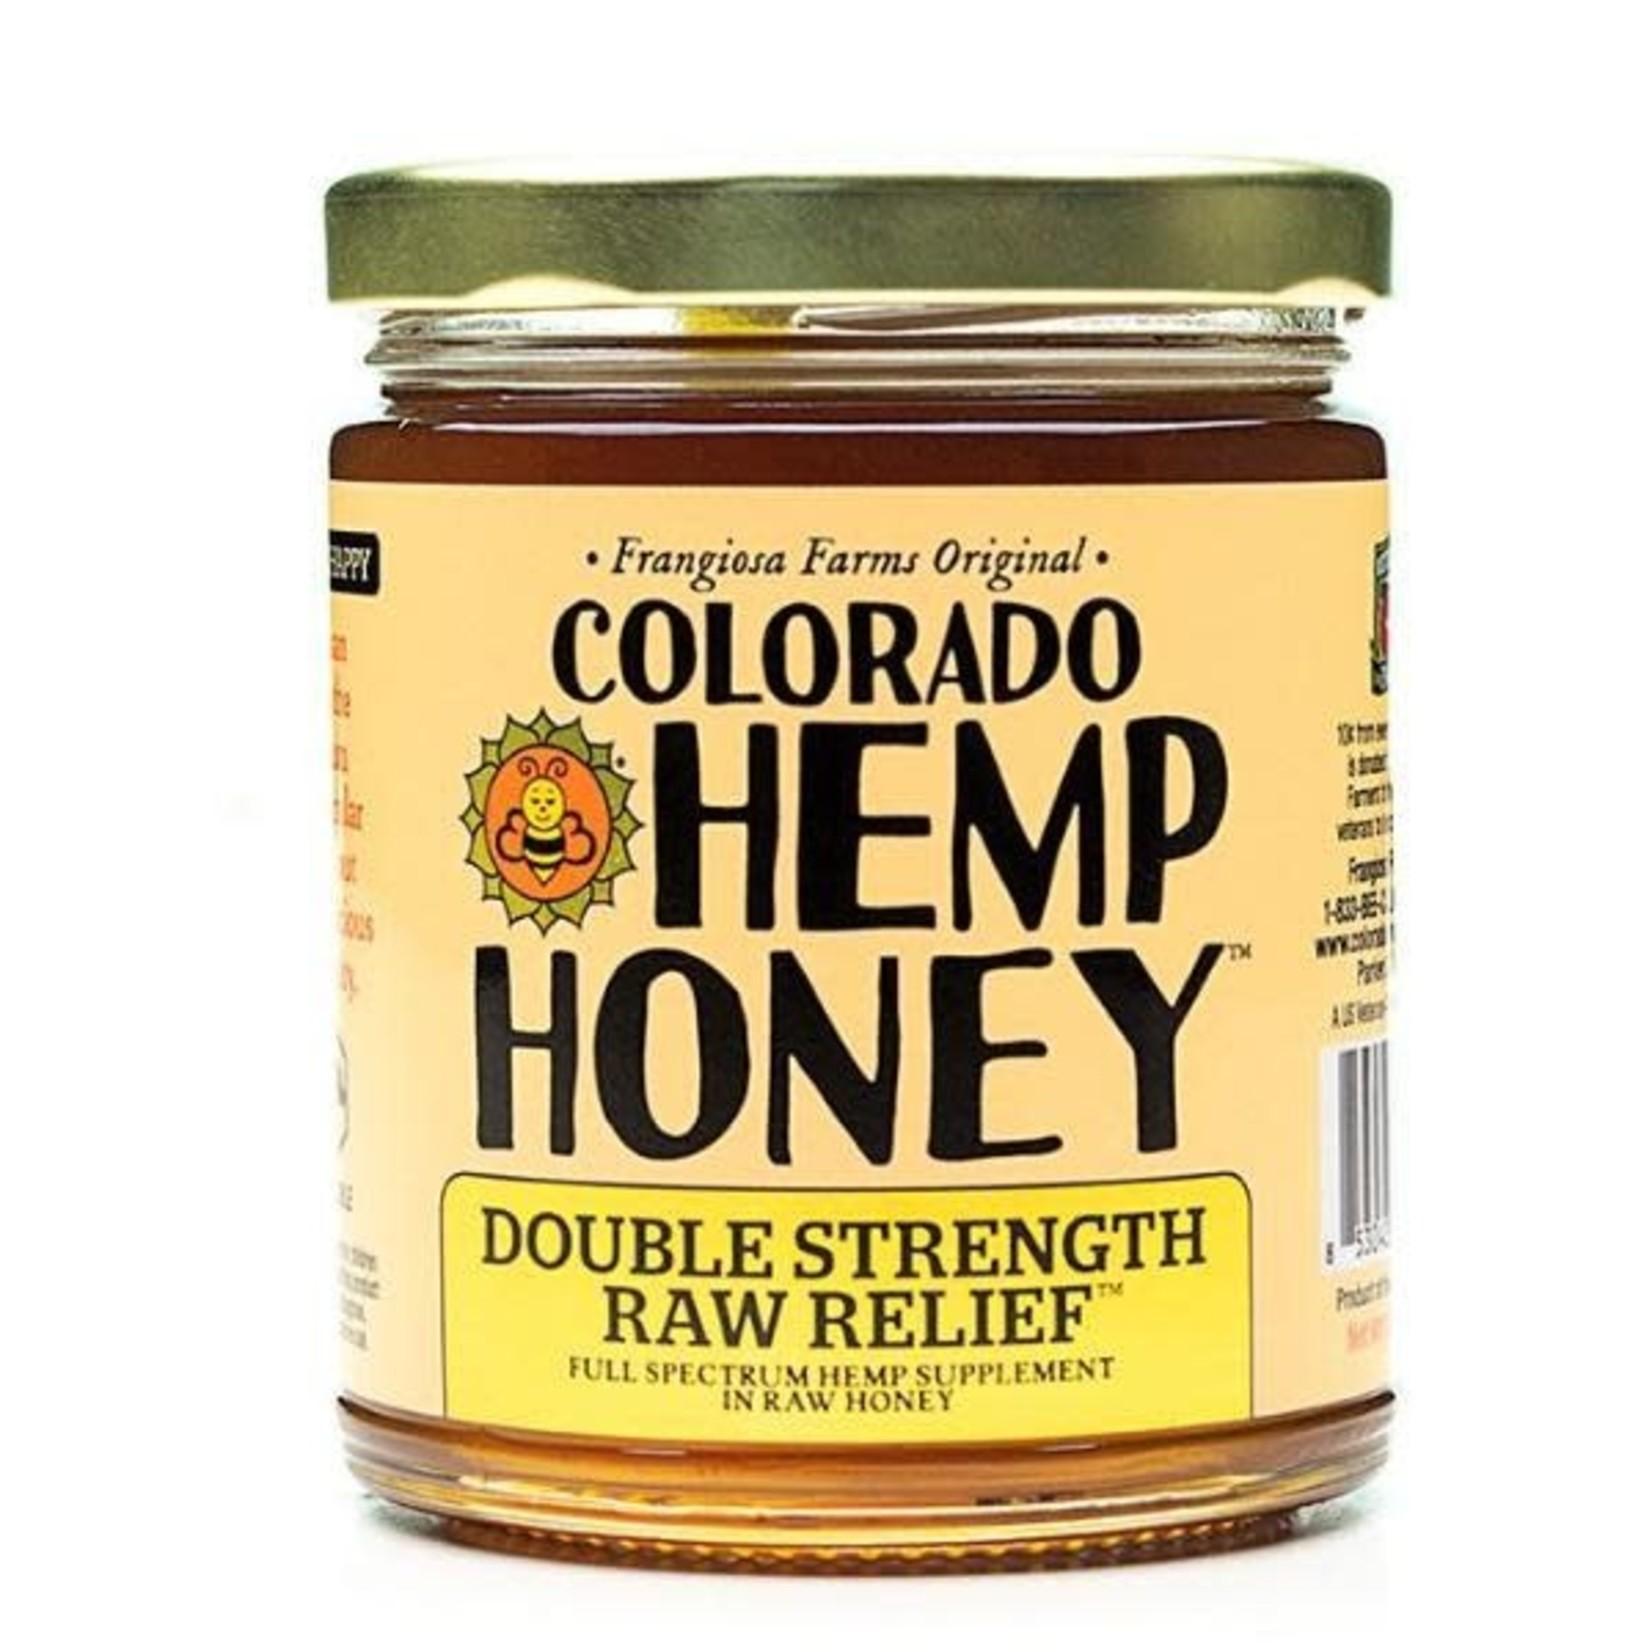 Hemp Honey Jars - with THC